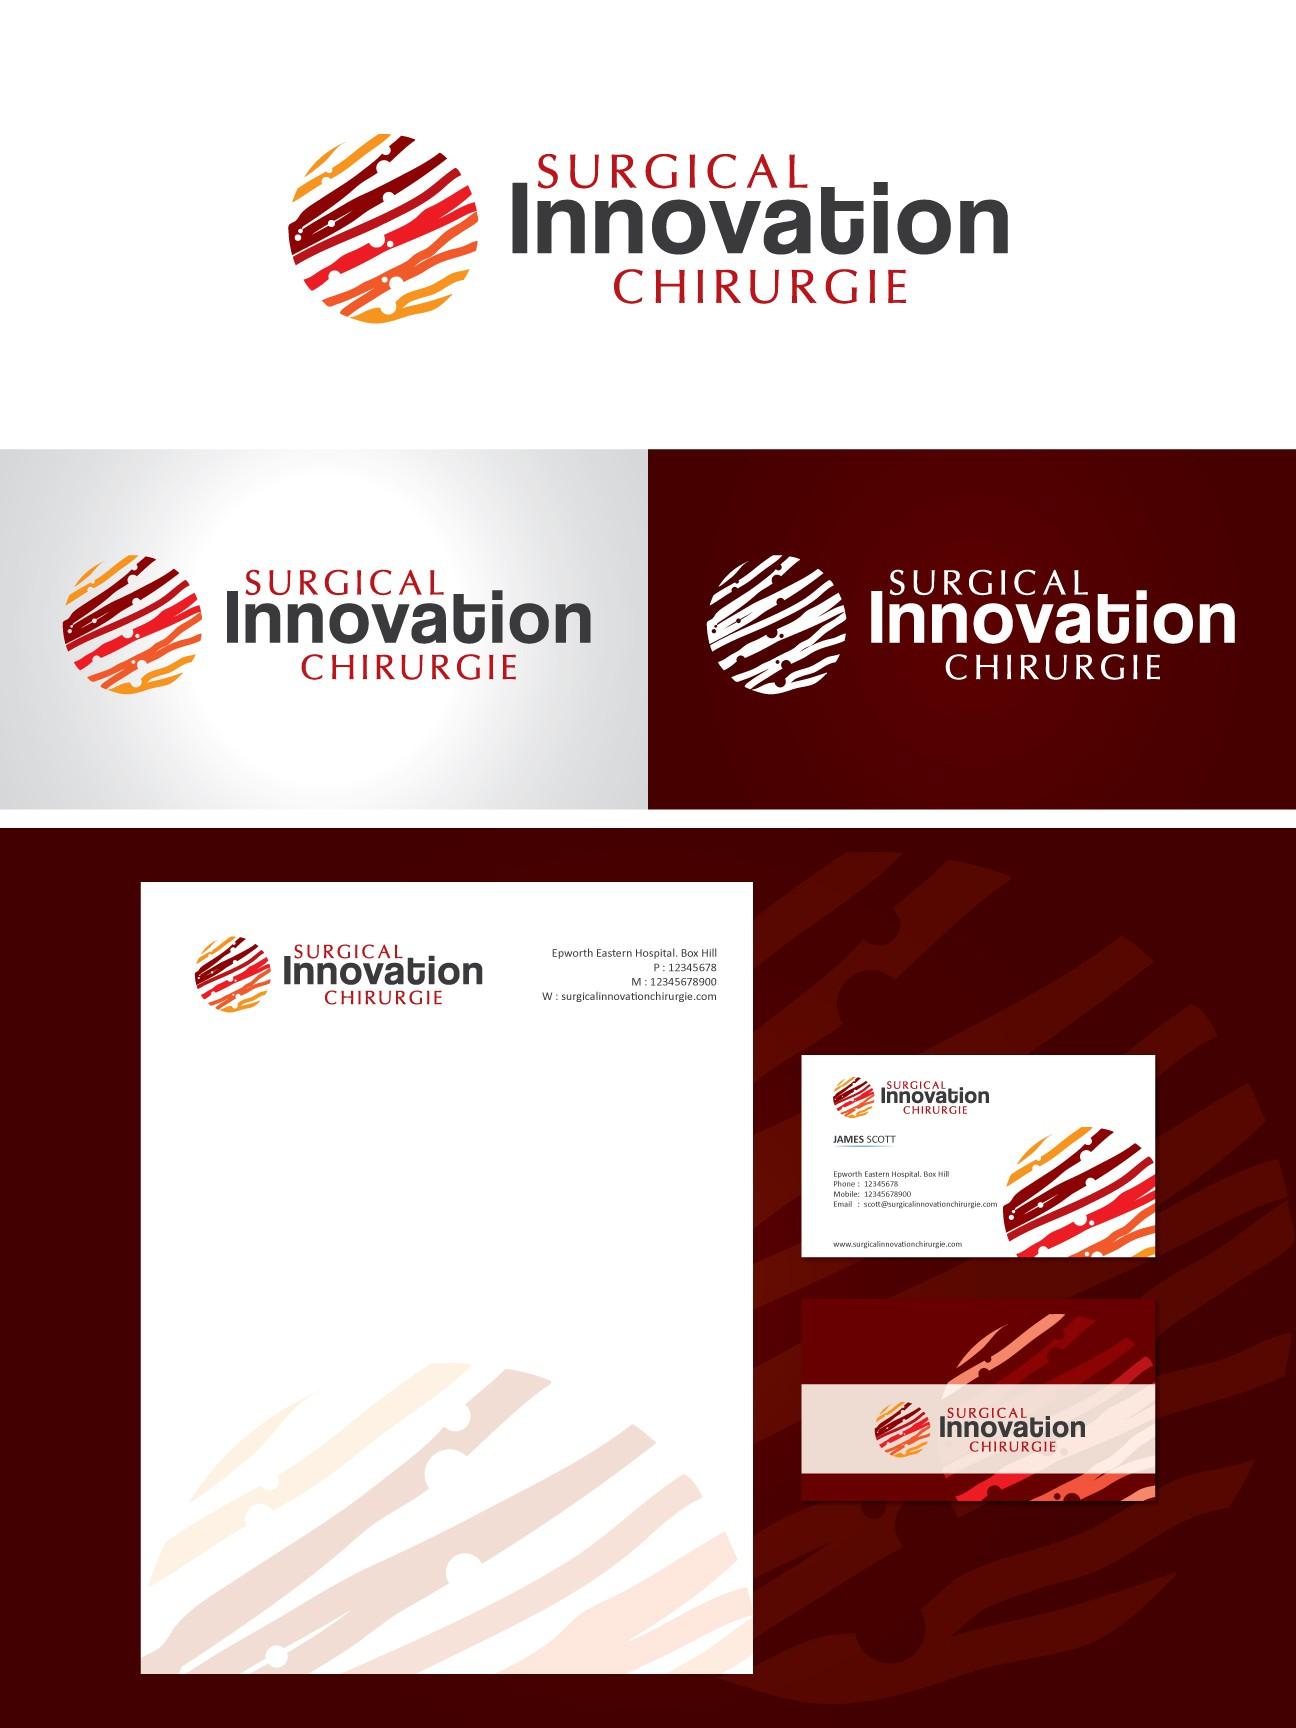 Bilingual logo for a new surgical innovation training program